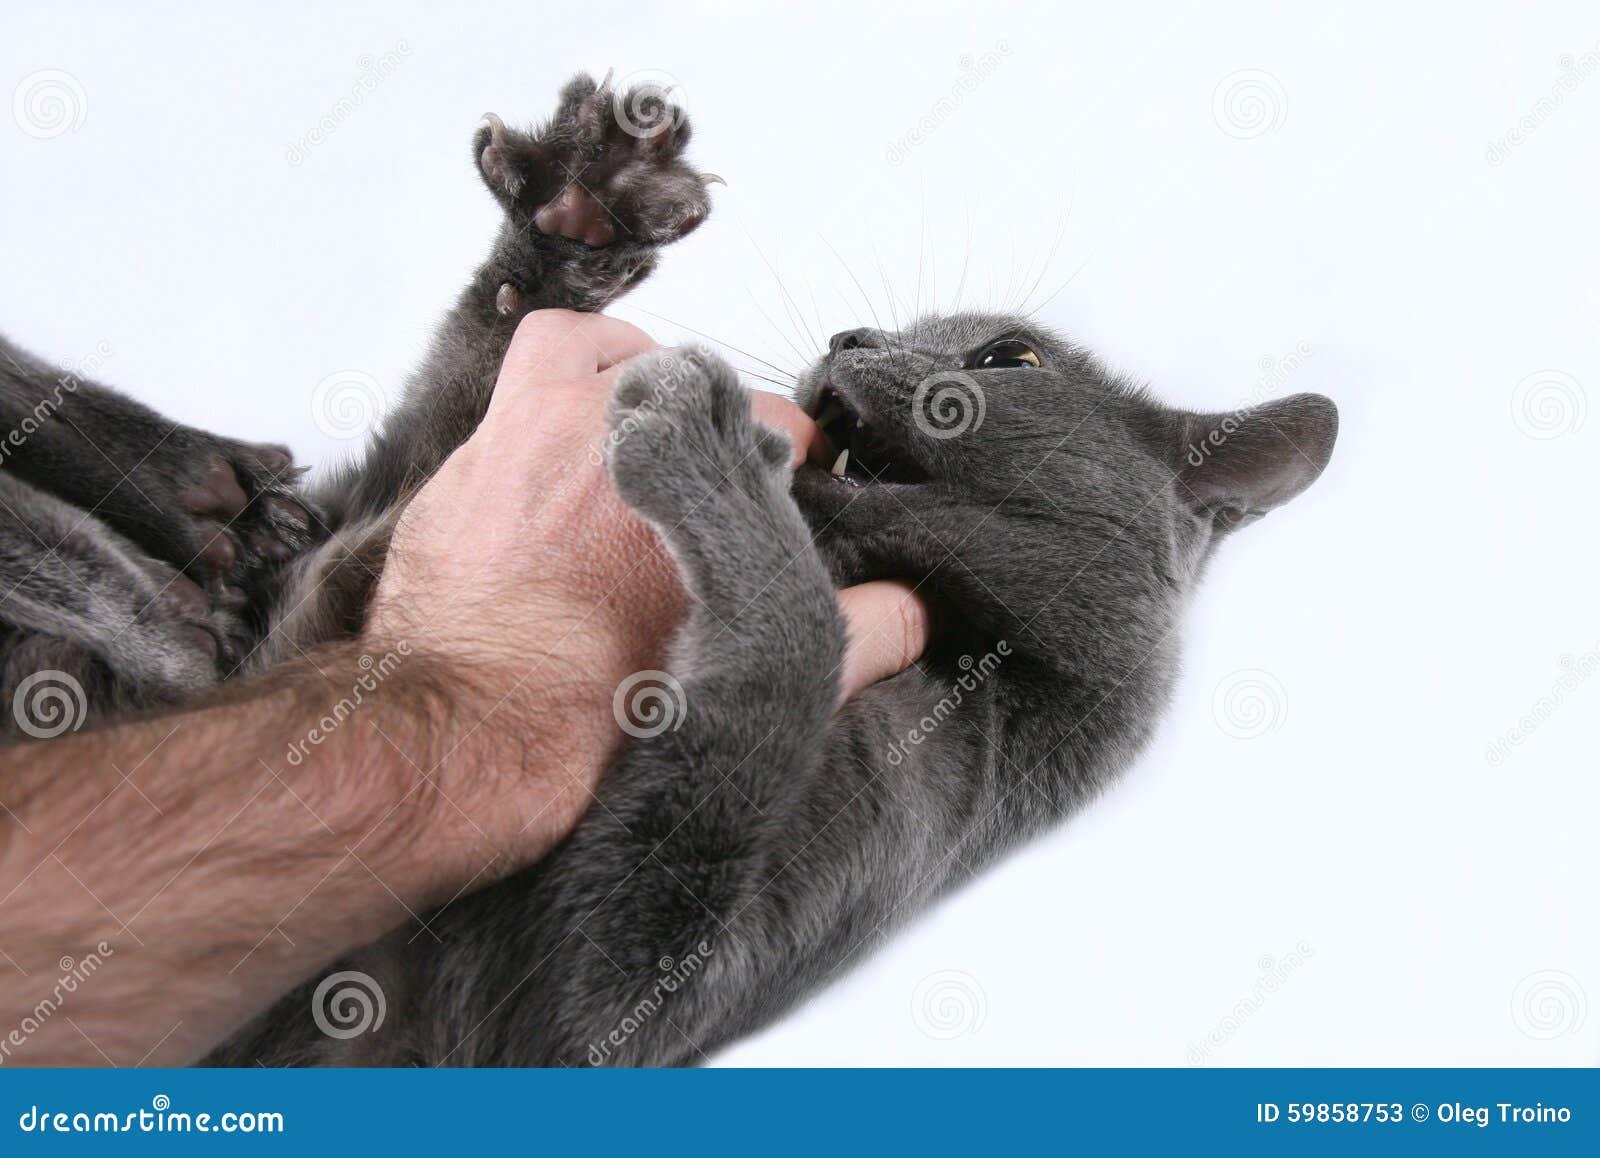 Grey cat aggressive bites the hand